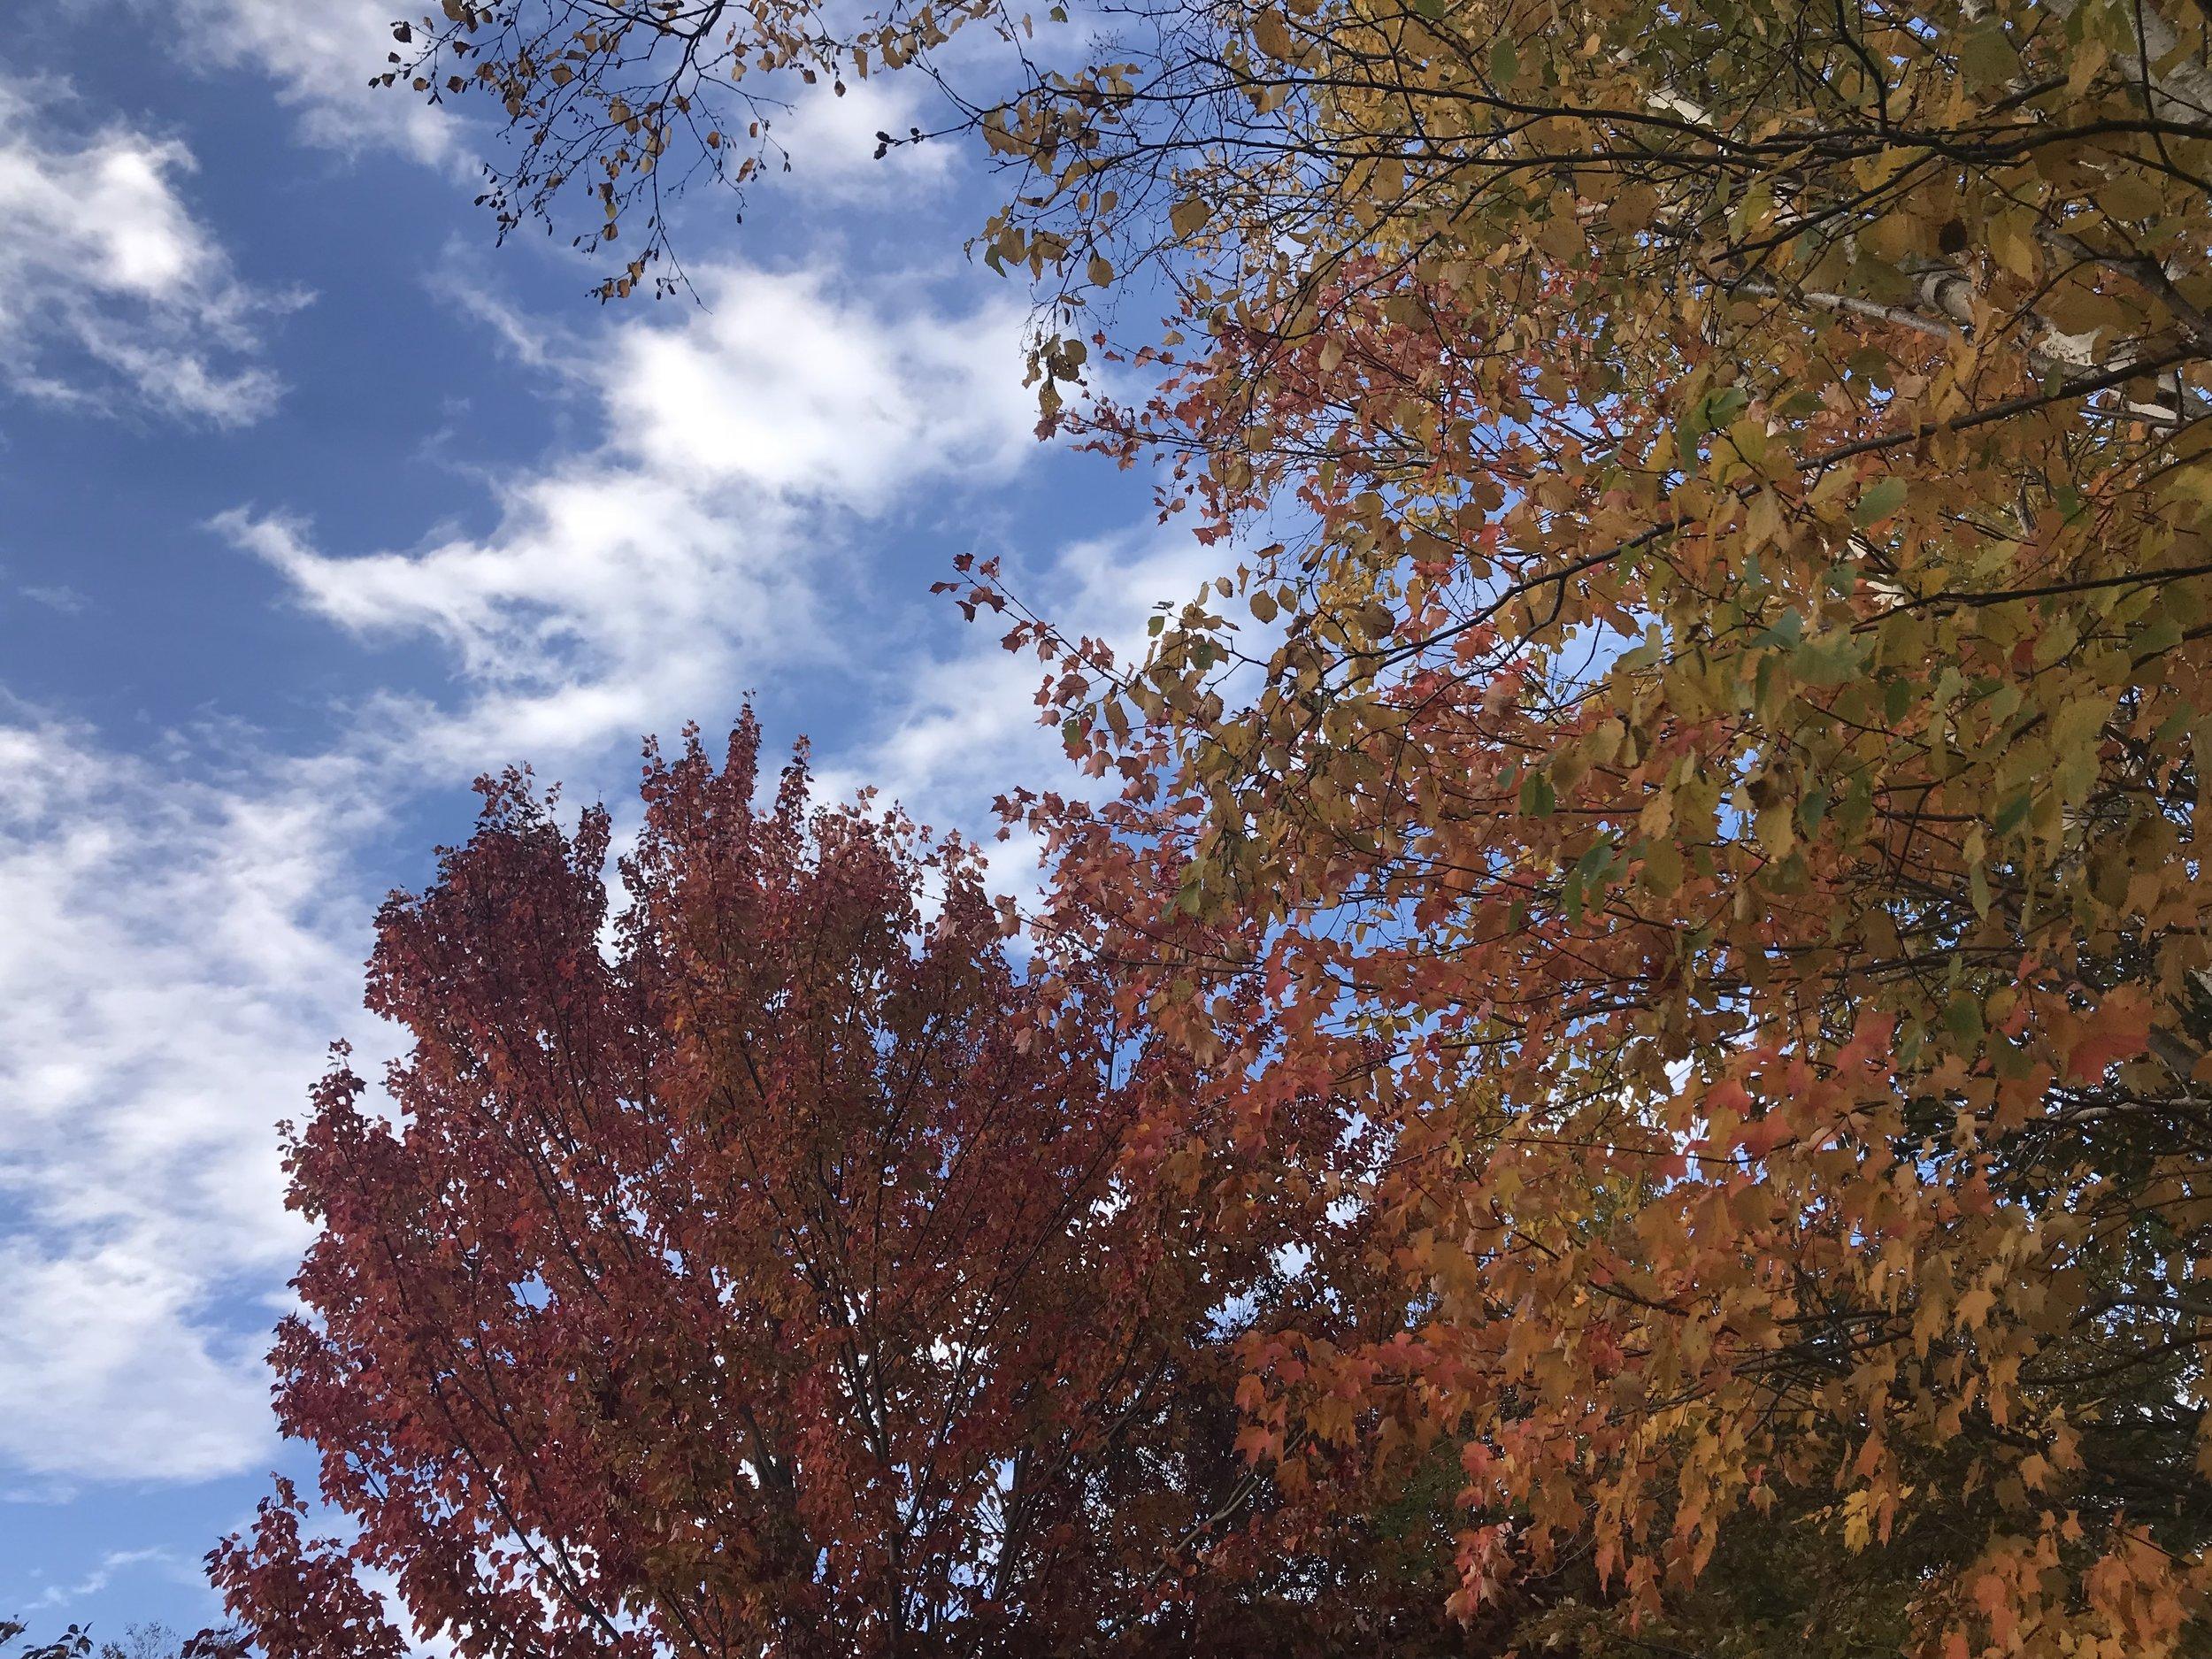 October.byamygrace